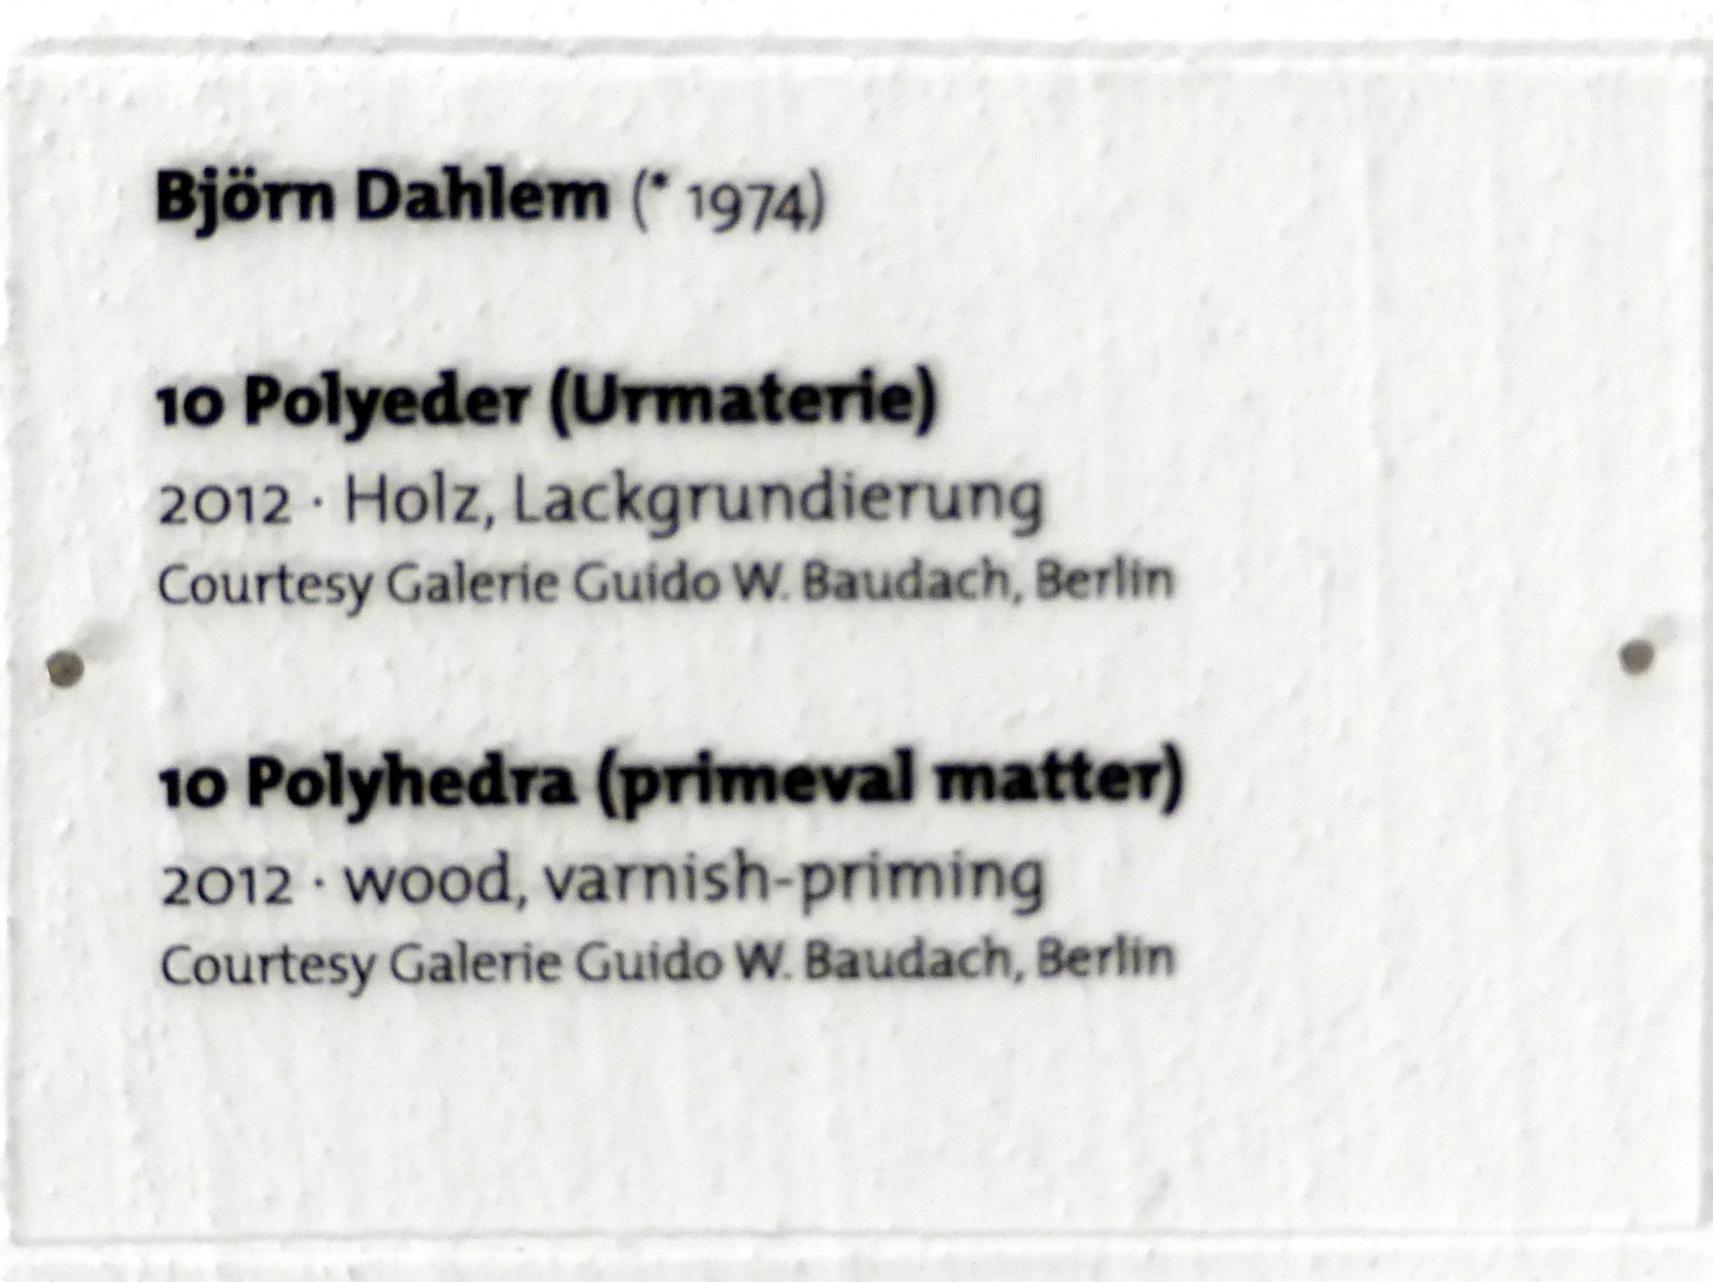 Björn Dahlem: 10 Polyeder (Urmaterie), 2012